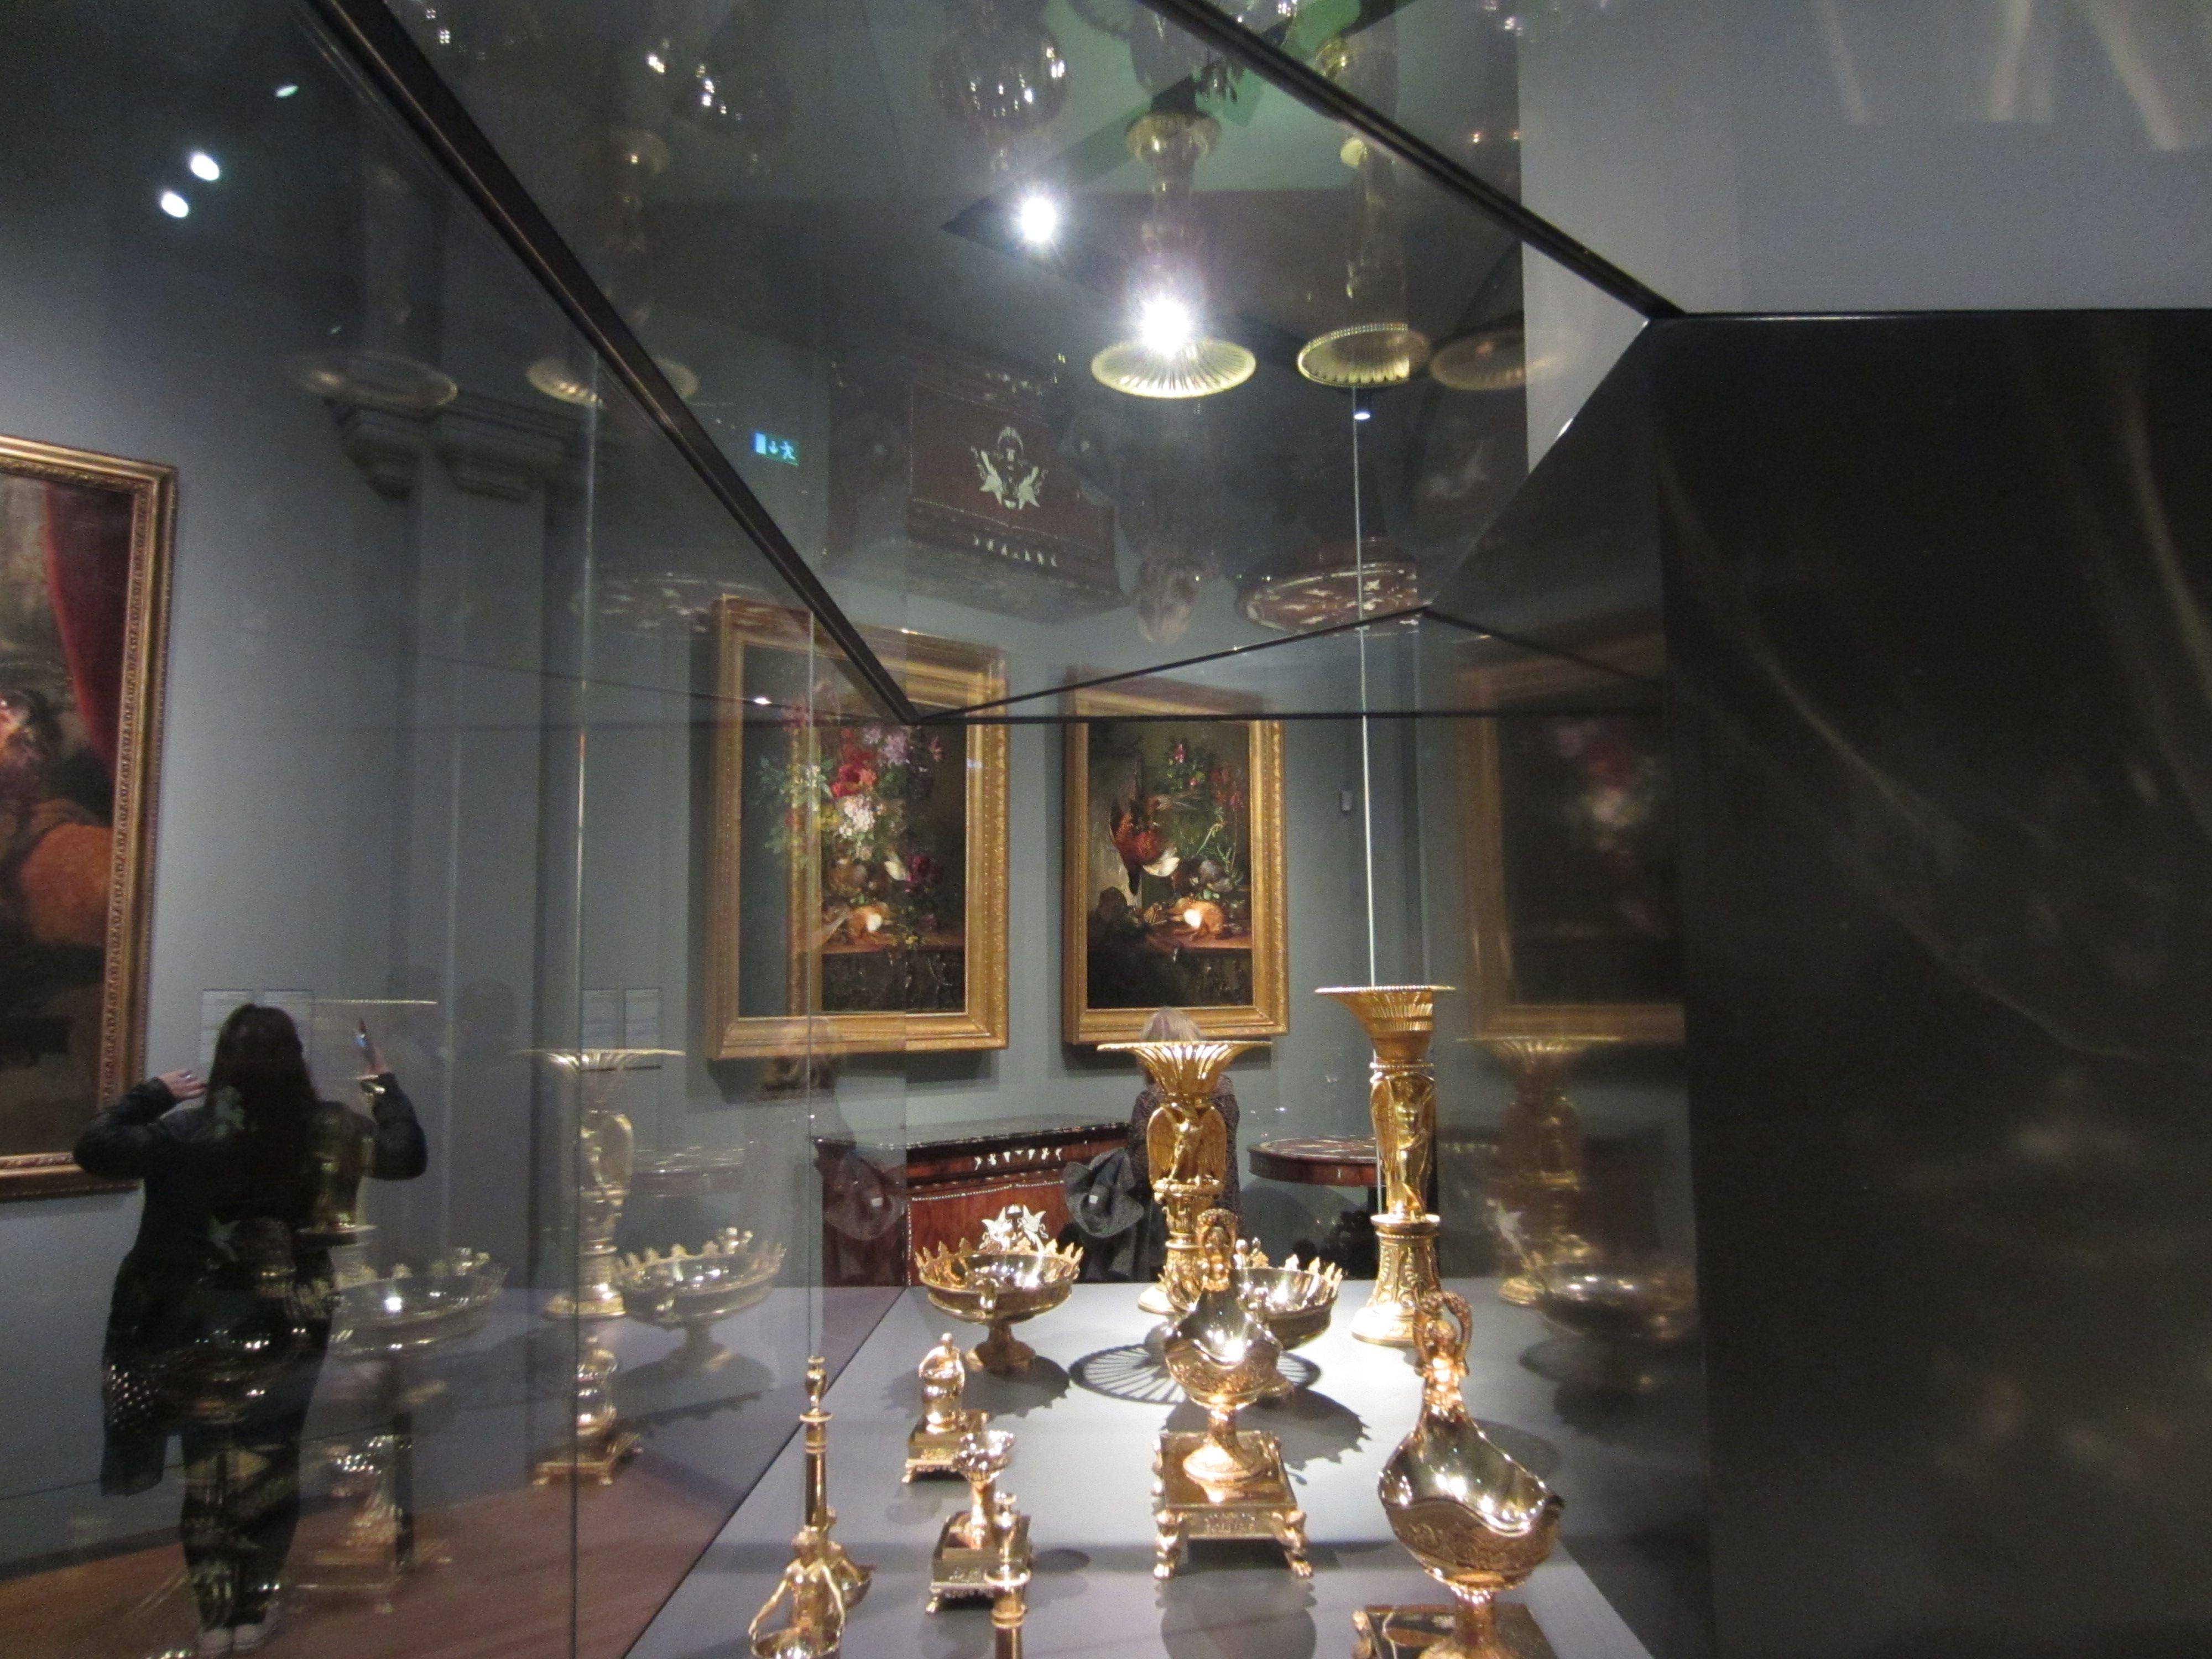 interieur Rijksmuseum   amsterdam   Pinterest